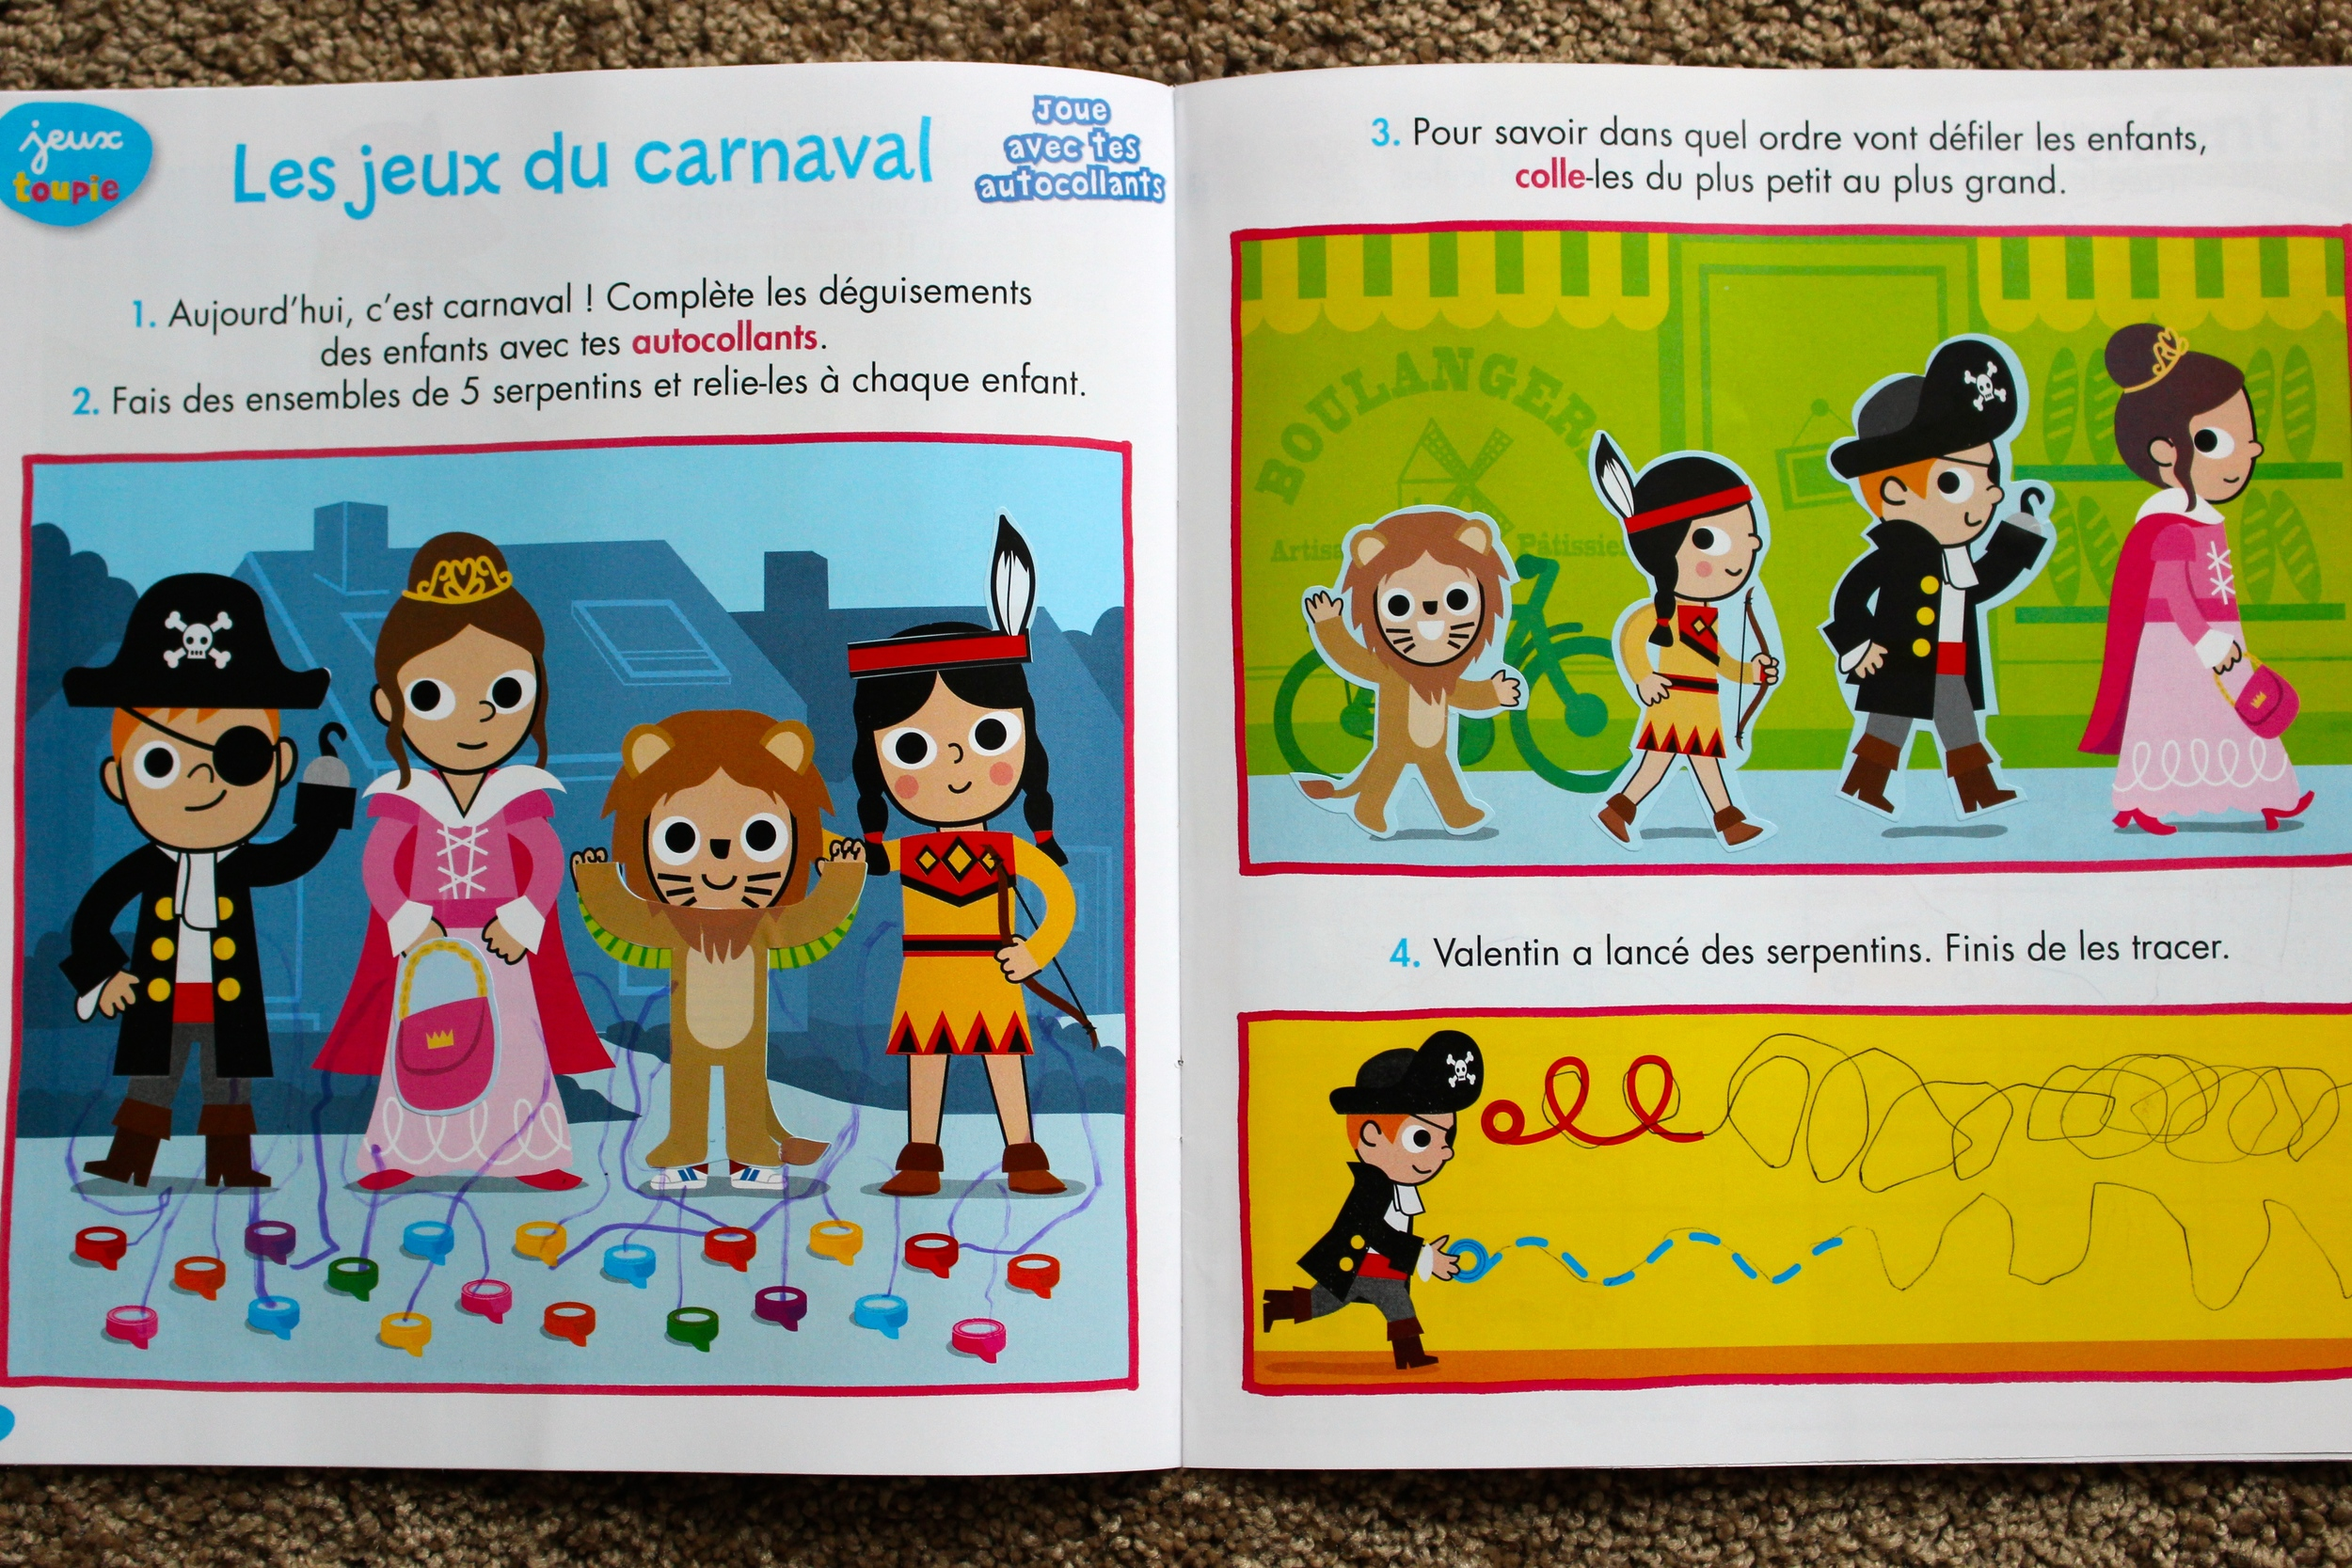 Toupie-magazine-example-French-activity-child.jpg